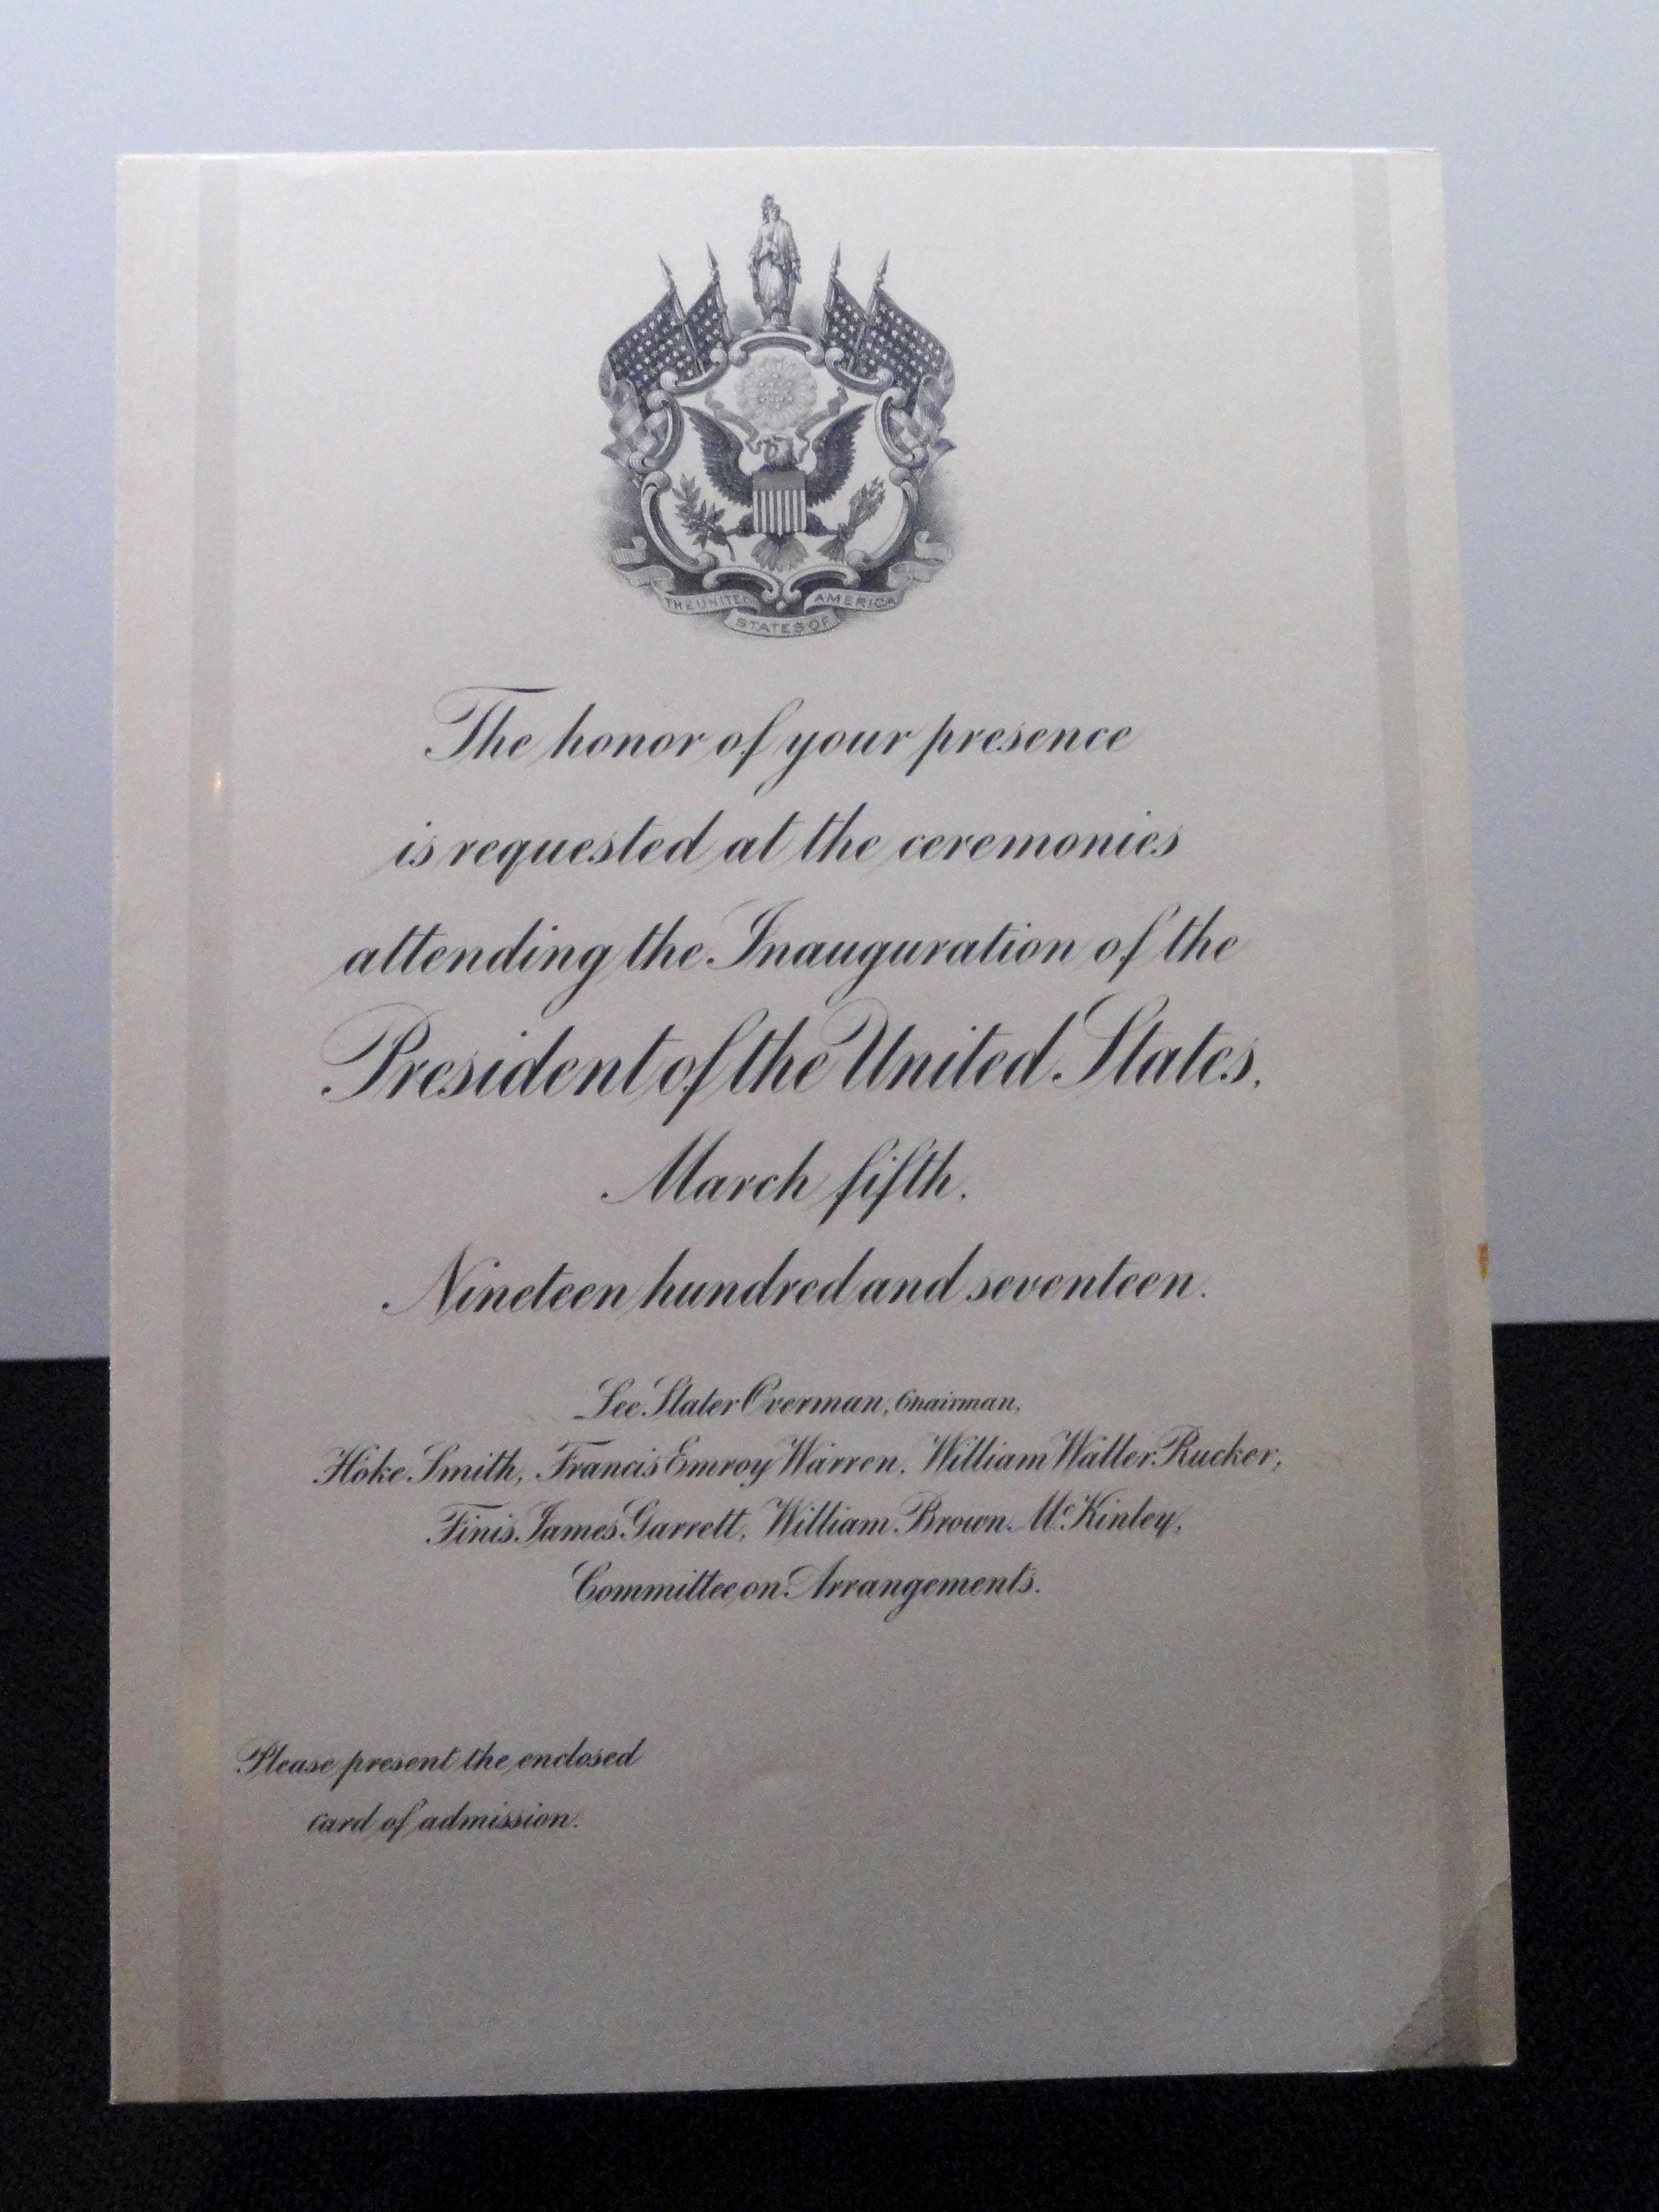 Fileus president woodrow wilson inauguration invitation march 5 fileus president woodrow wilson inauguration invitation march 5 1917 national world stopboris Image collections